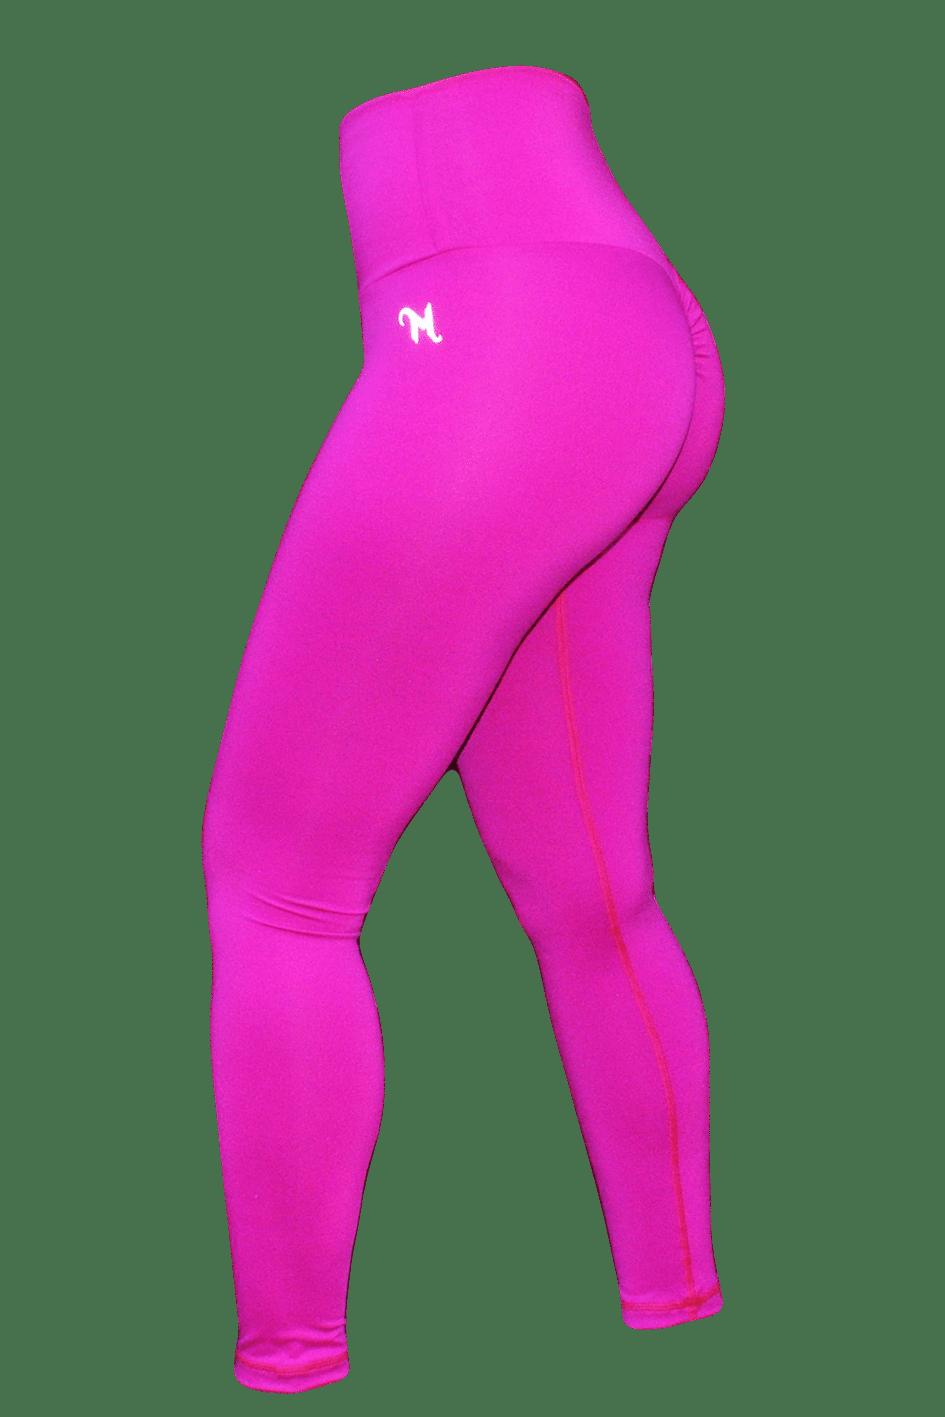 Shaper-pink-Mfit